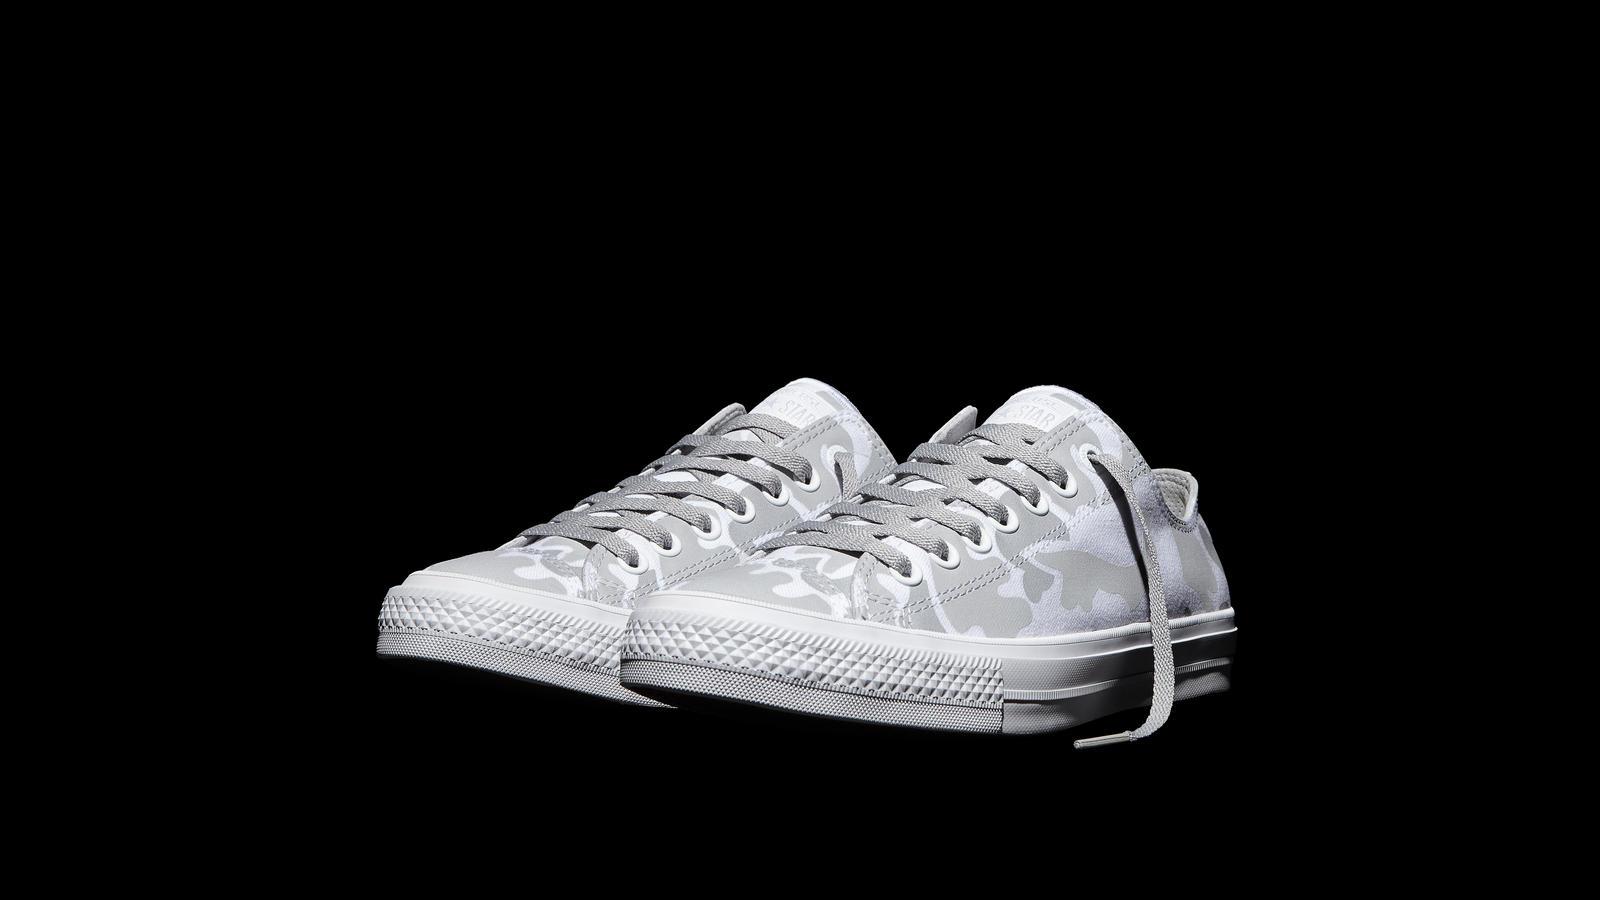 3c627623d1ae Converse Chuck Taylor All Star Ii Reflective Camo White Pair Original